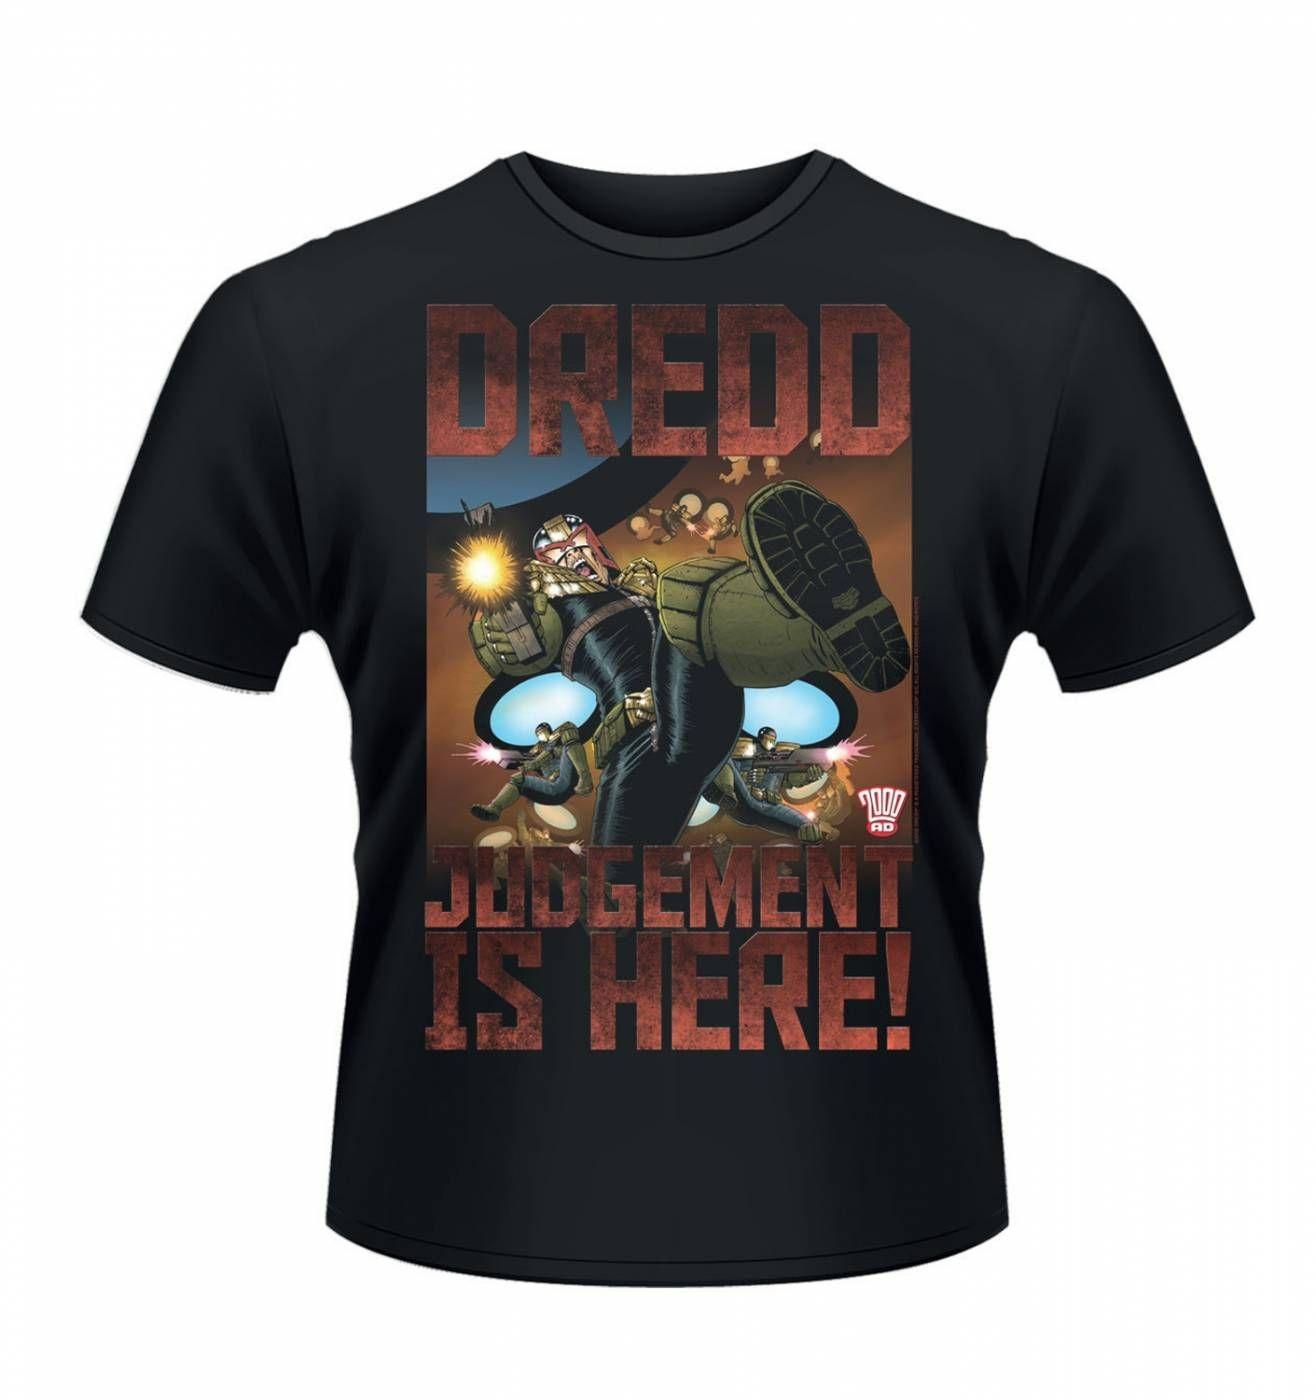 OFFICIAL Judge Dredd Judgement is here men's t-shirt